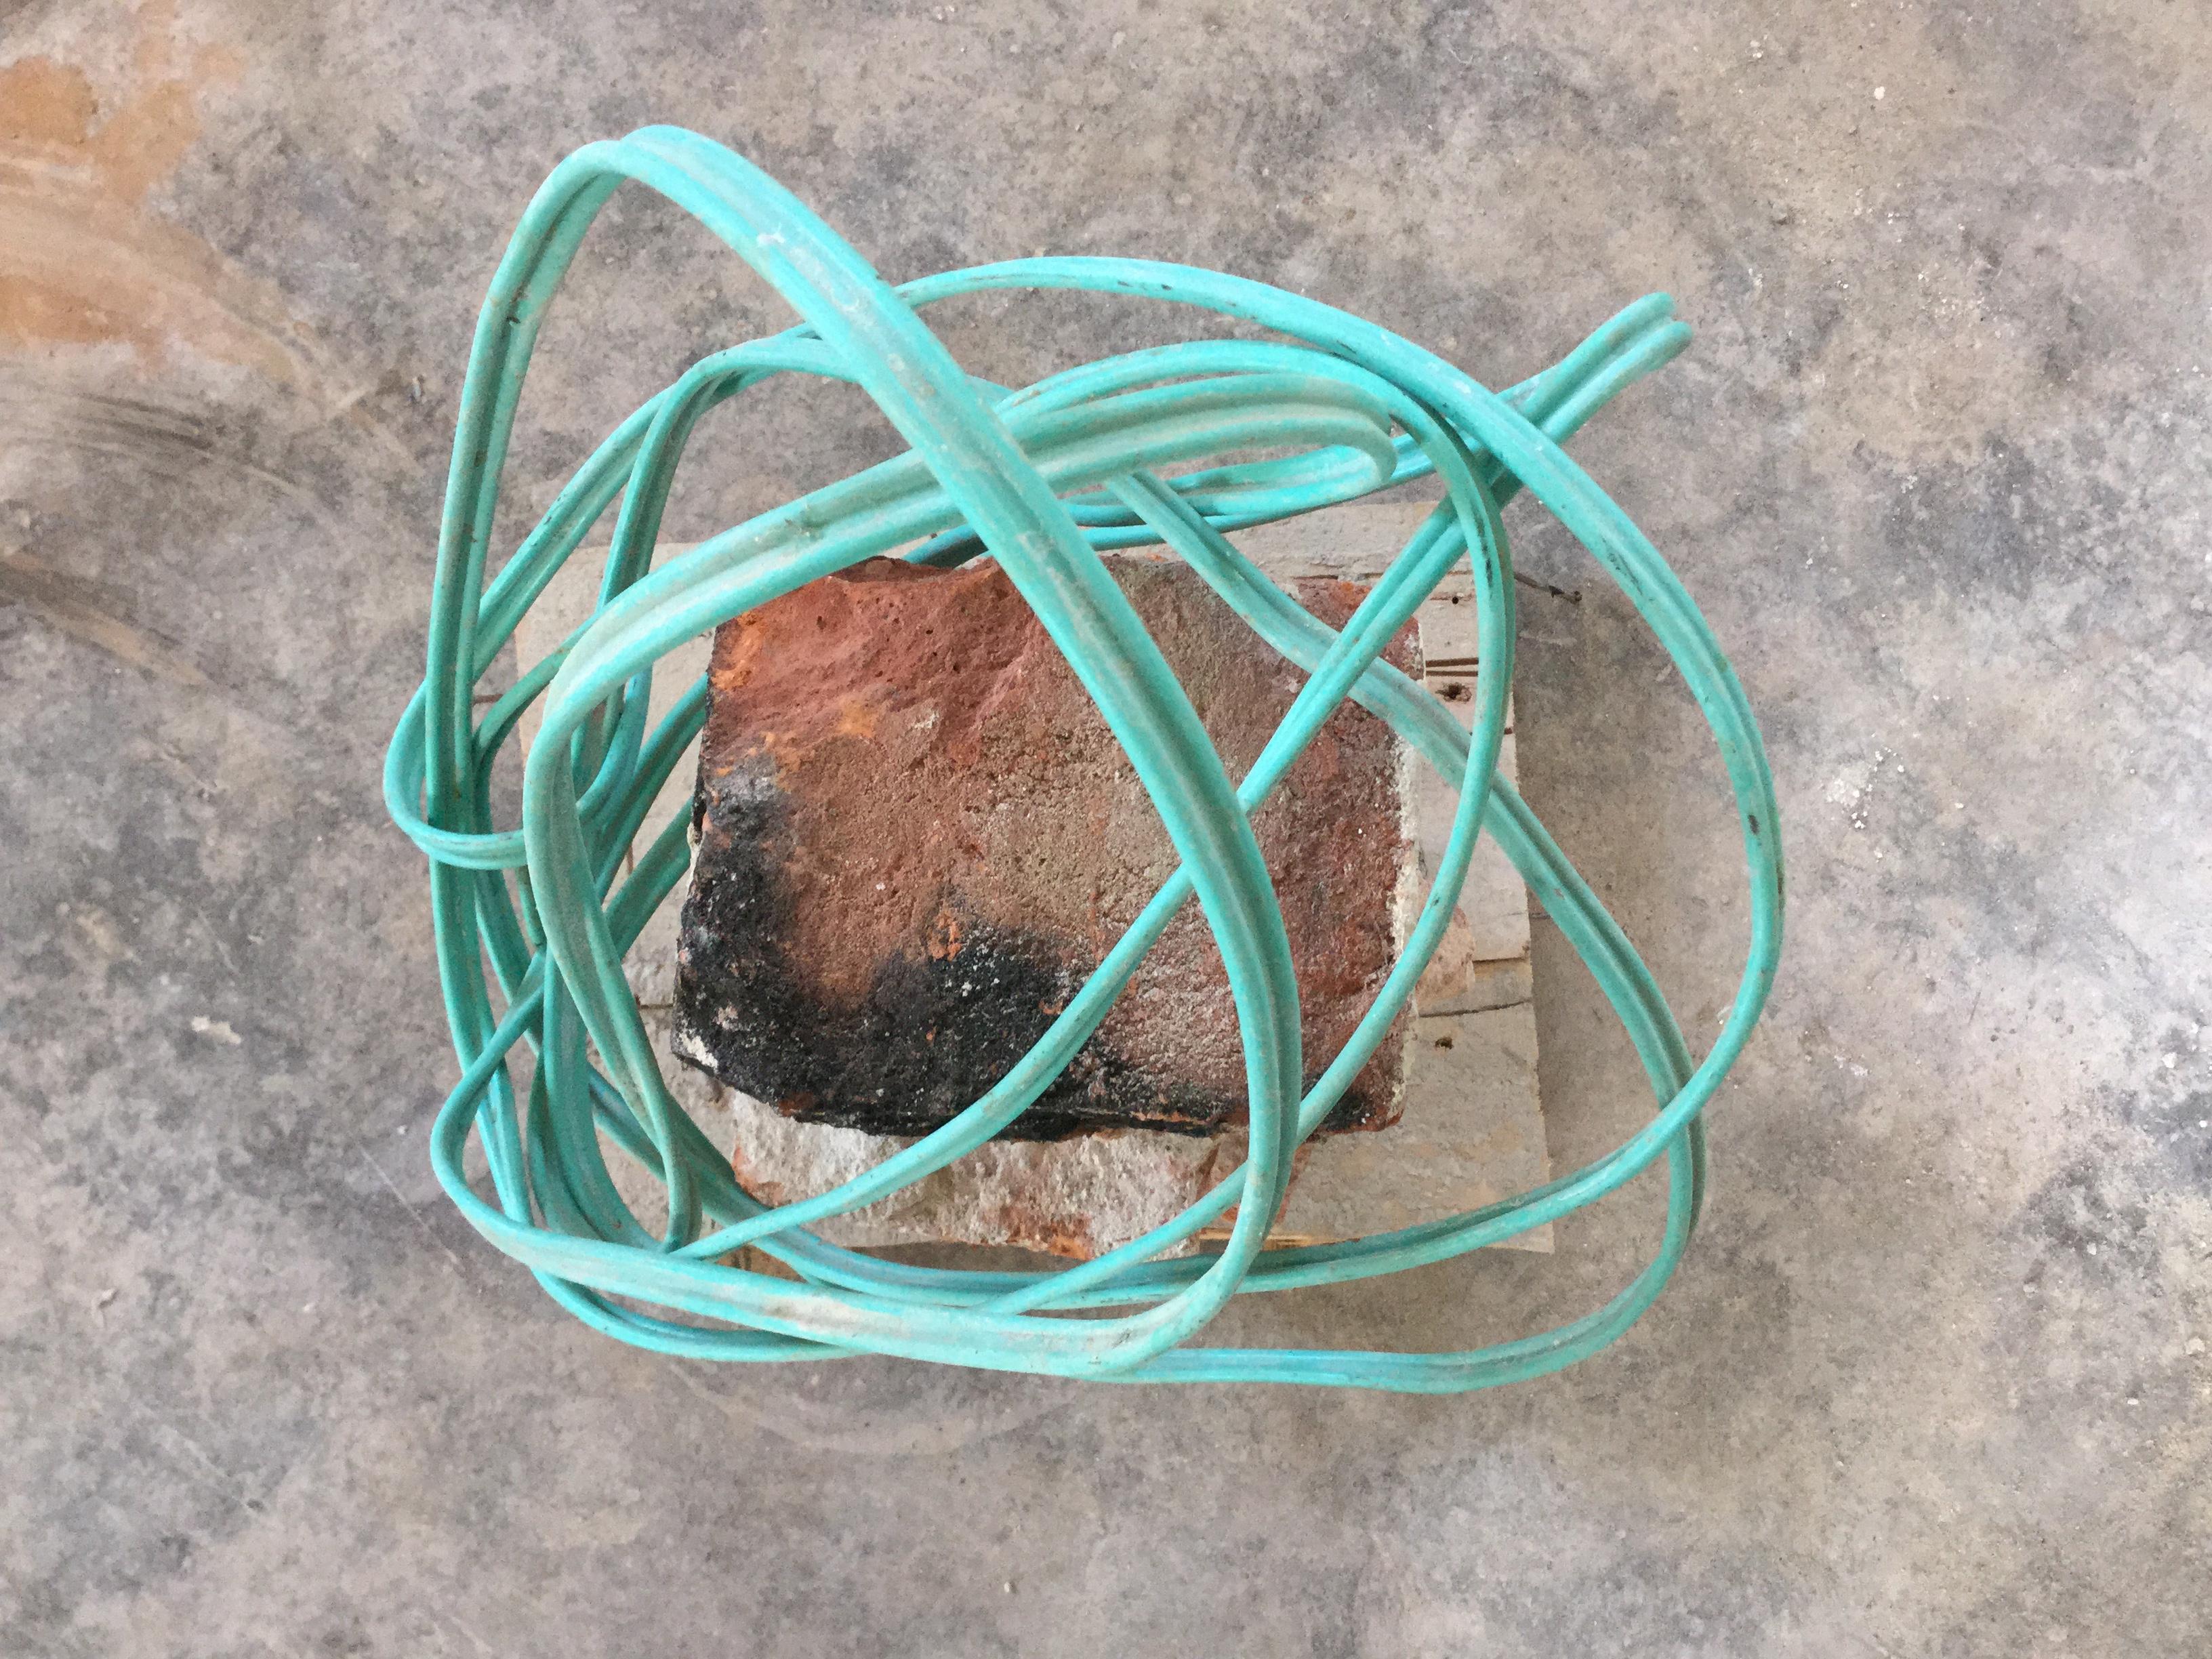 instalatia jibou teodora pica 004